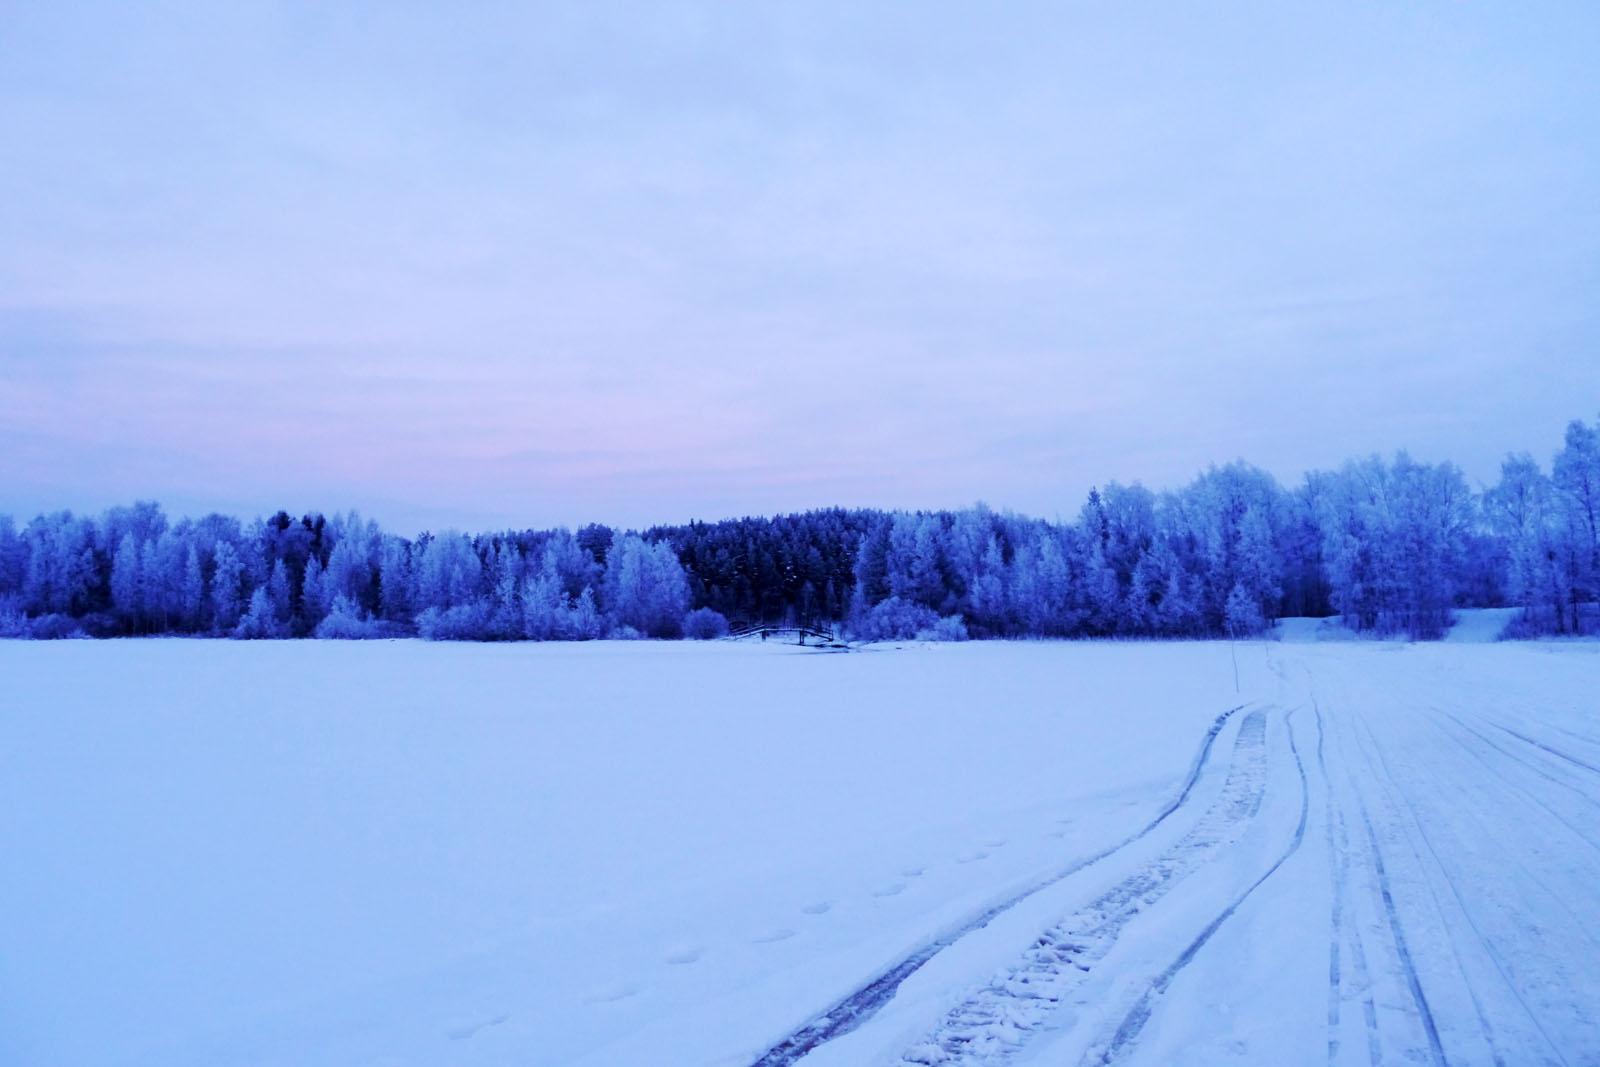 vuokatti-finnland-winter-schneemobil tour-snowmobile-zugefrorener see